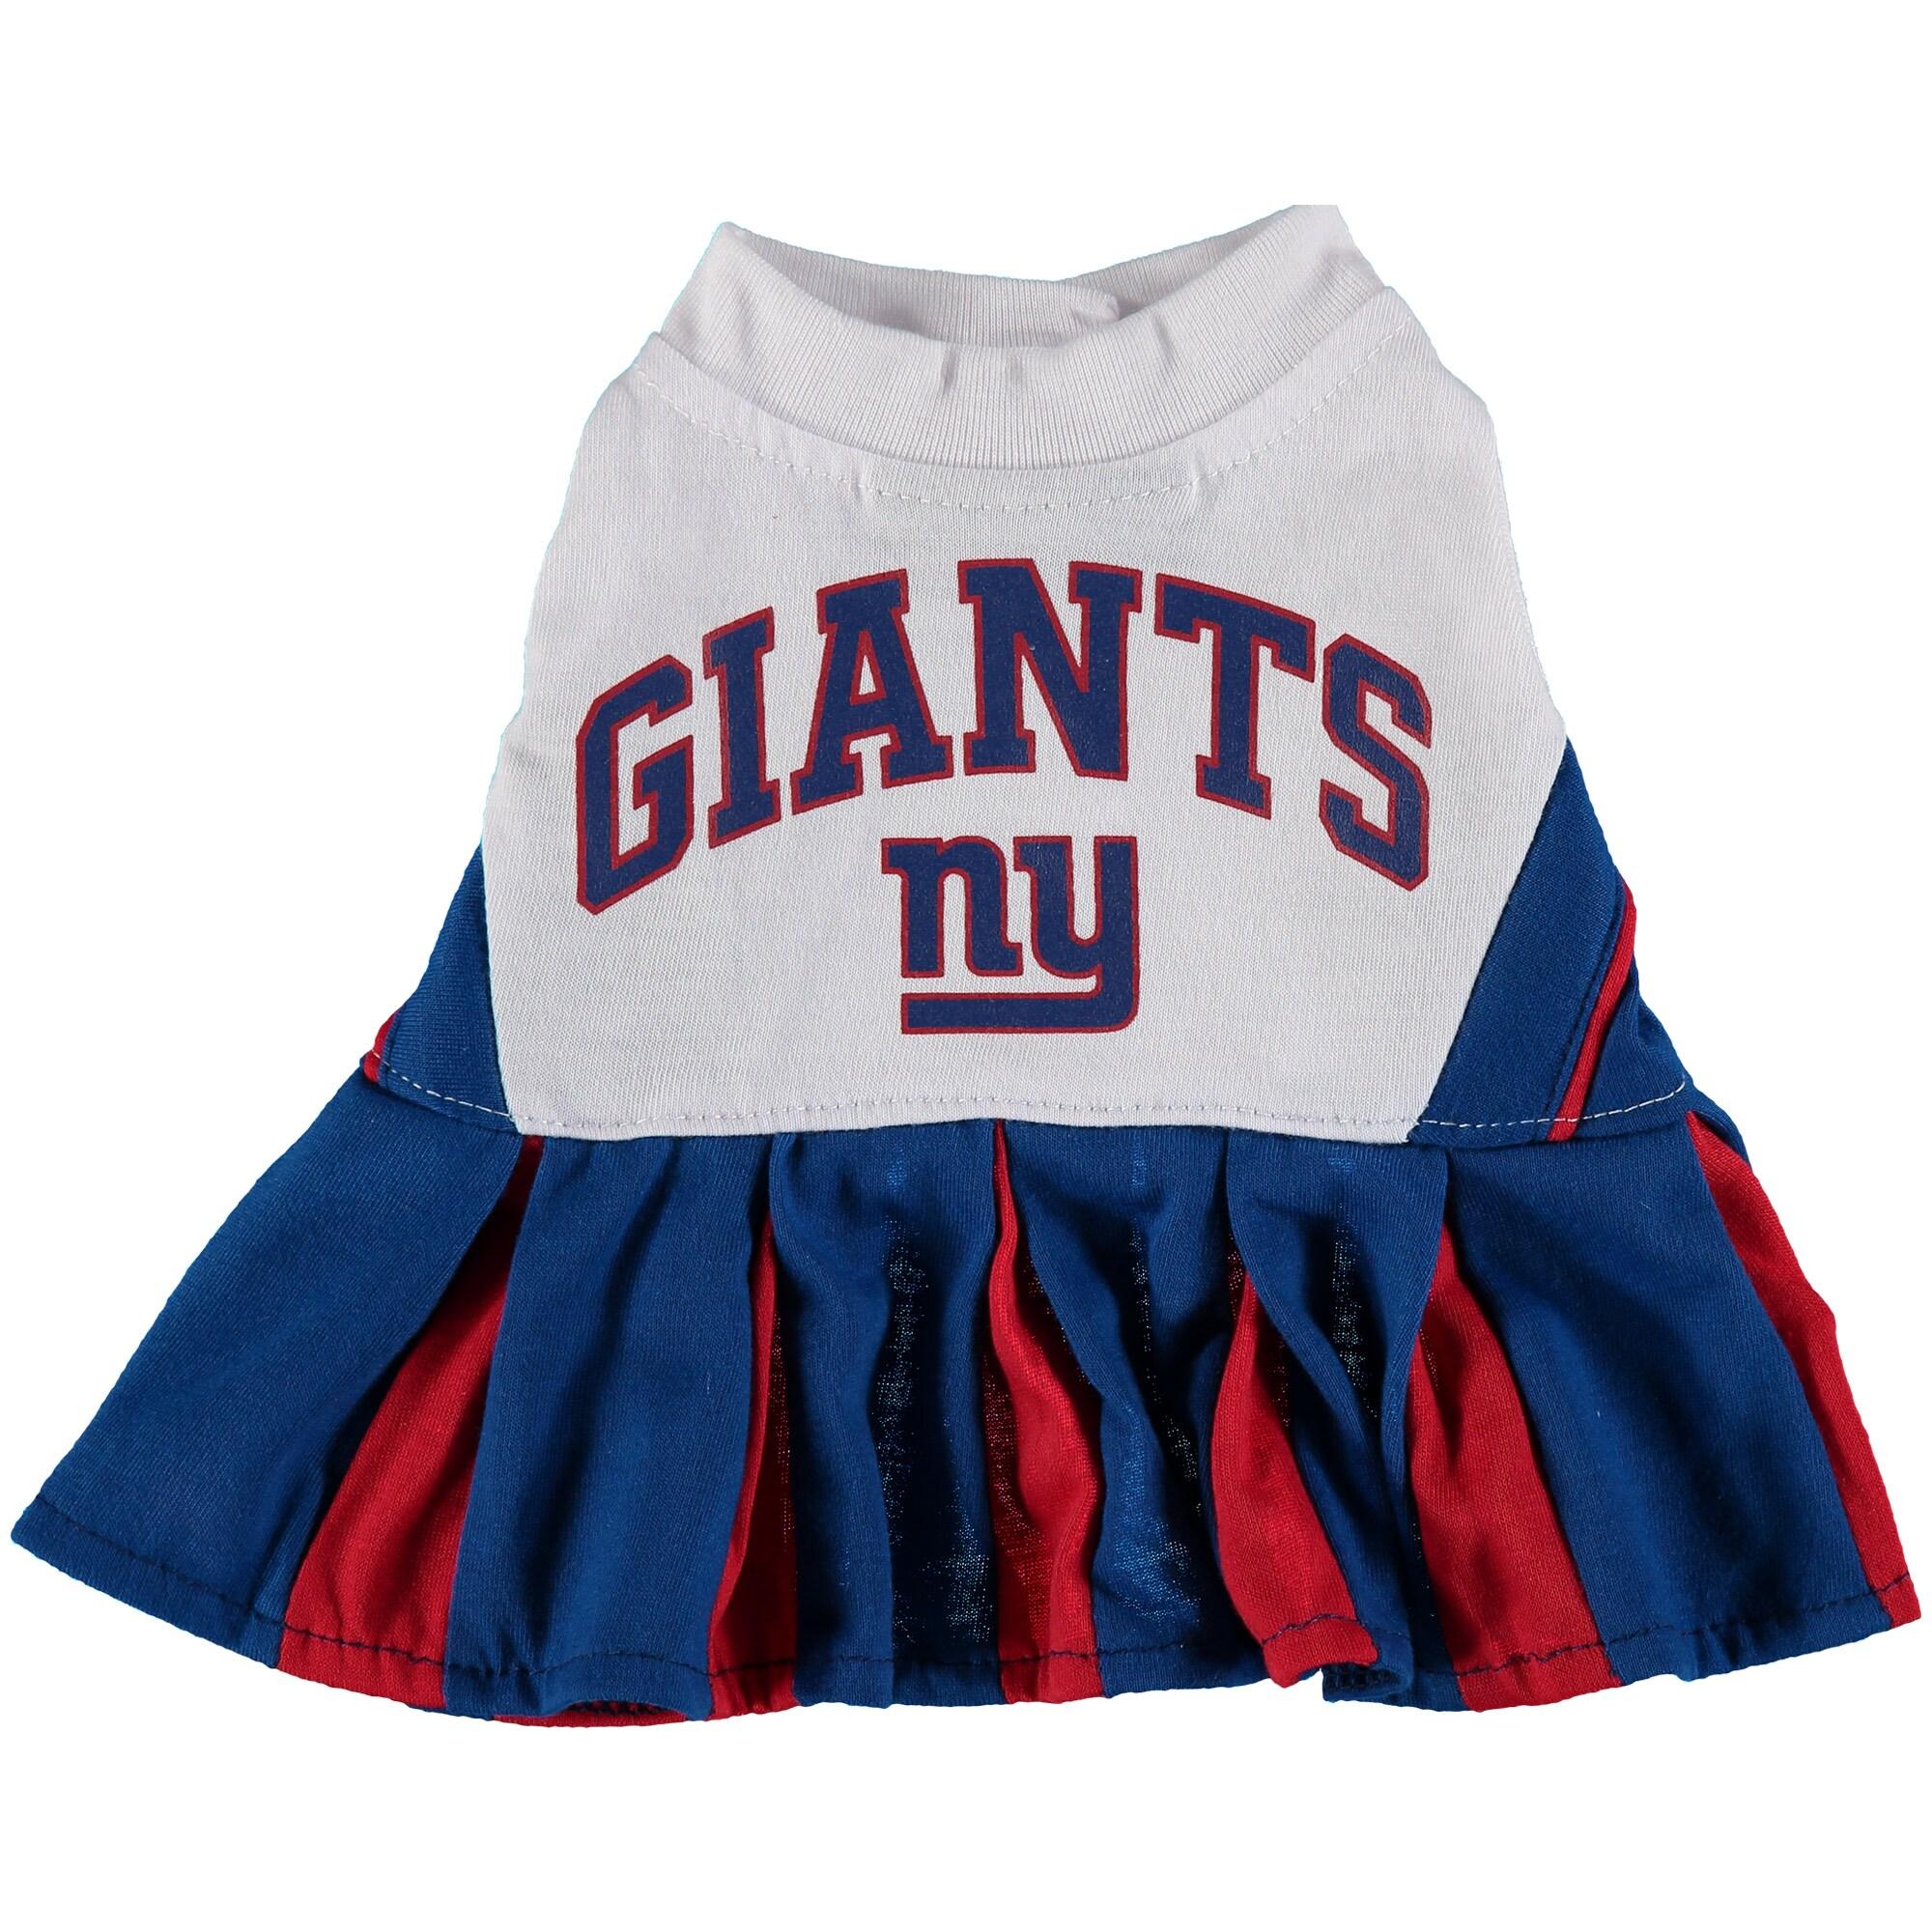 New York Giants Cheerleader Pet Outfit